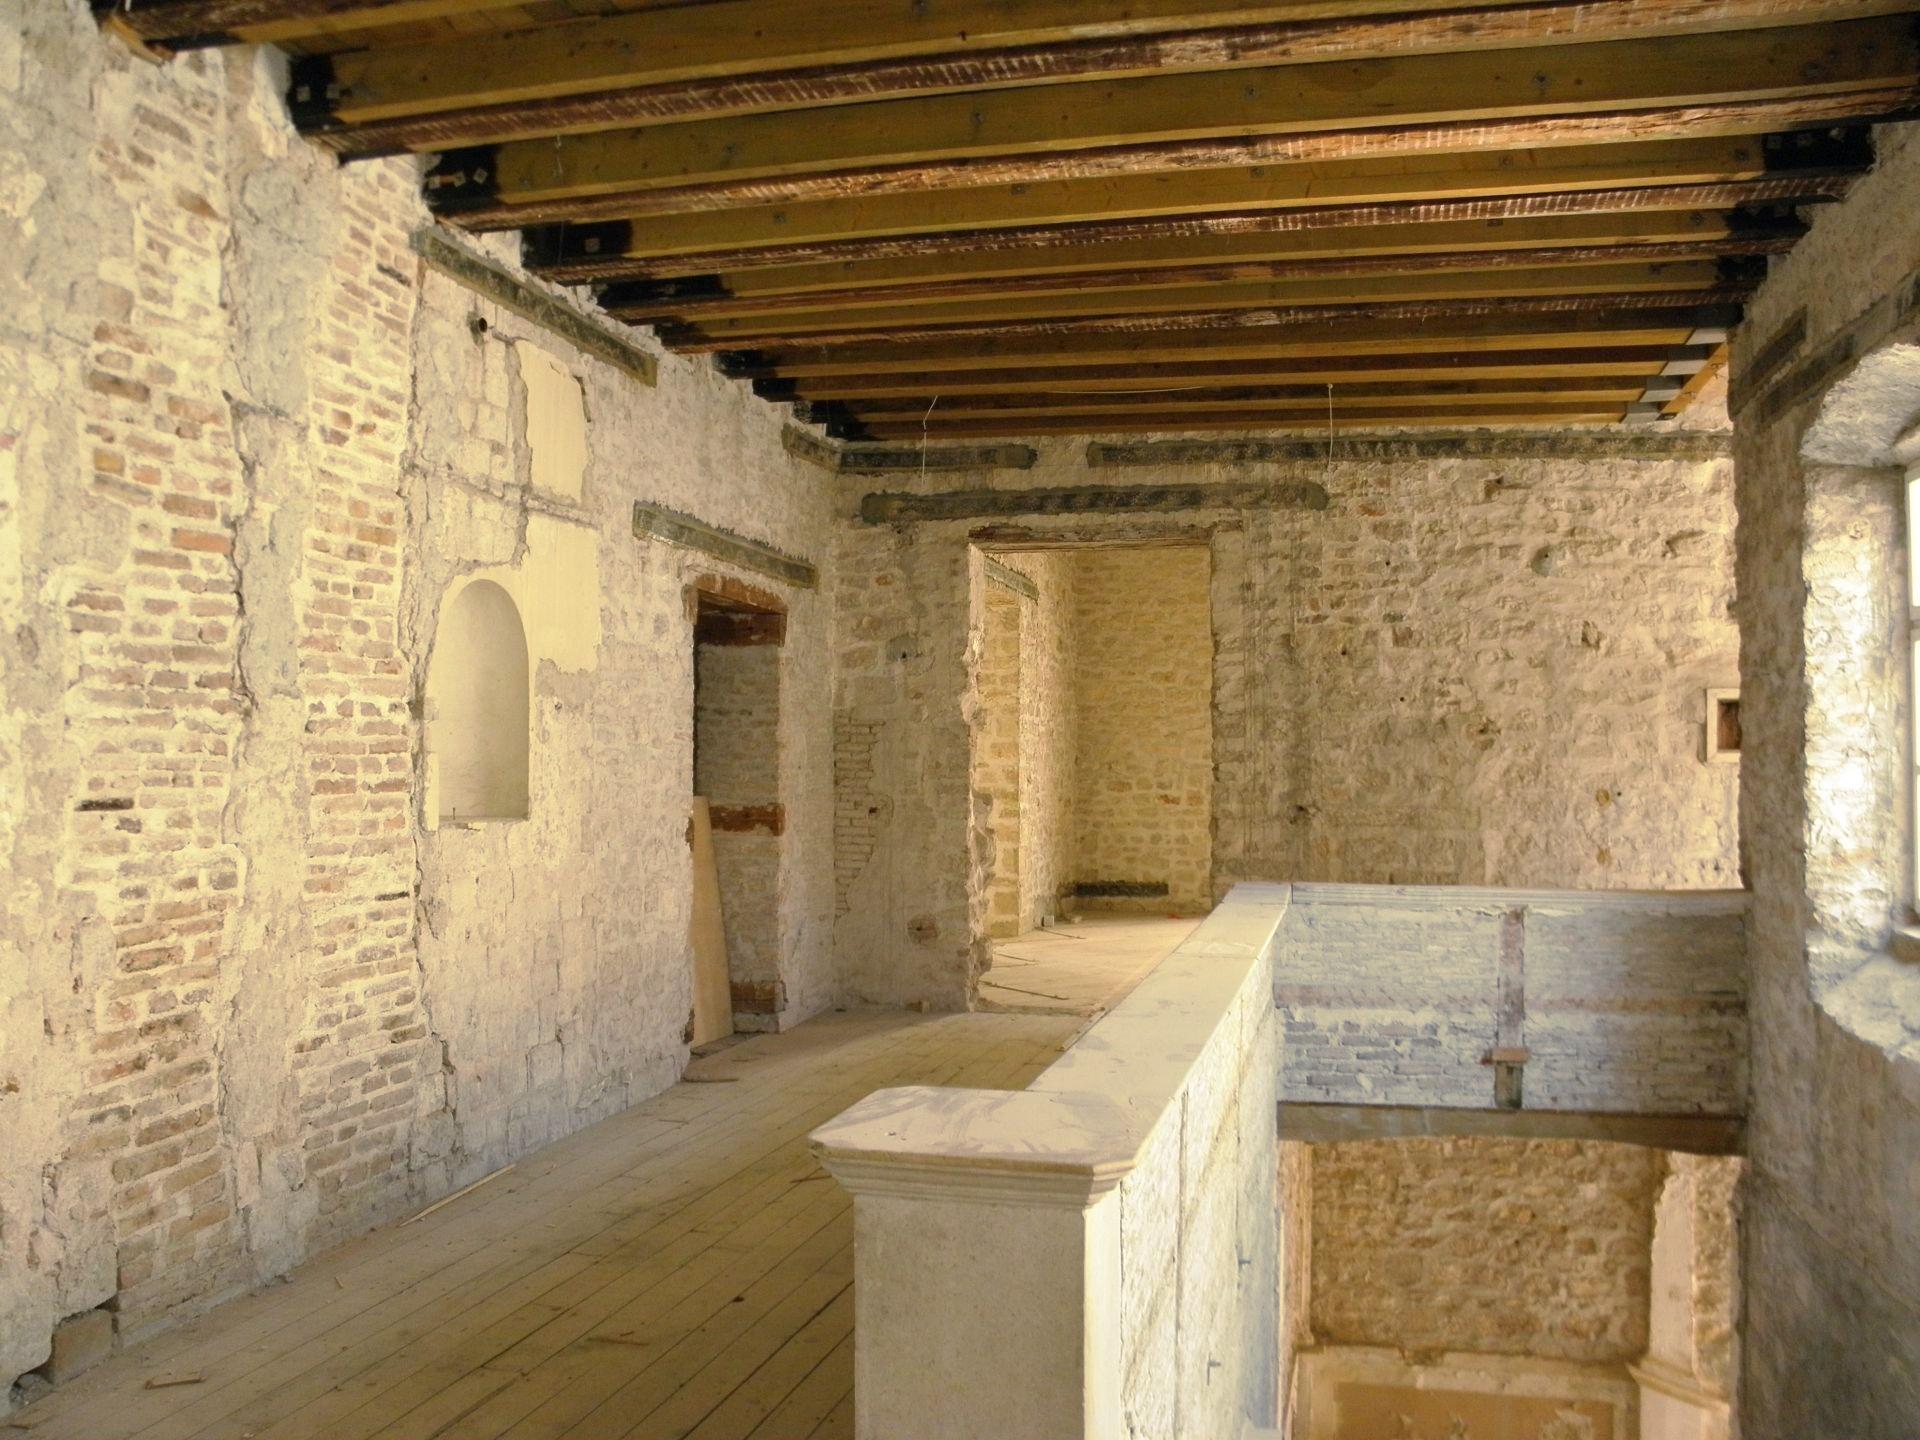 muzej dvije palače, kneževa palača, zadar, hrvatska, ab forum, upi-2m, zidano, muzej, dvije palače, palača, 2 palaces museum, palace, rector's palace